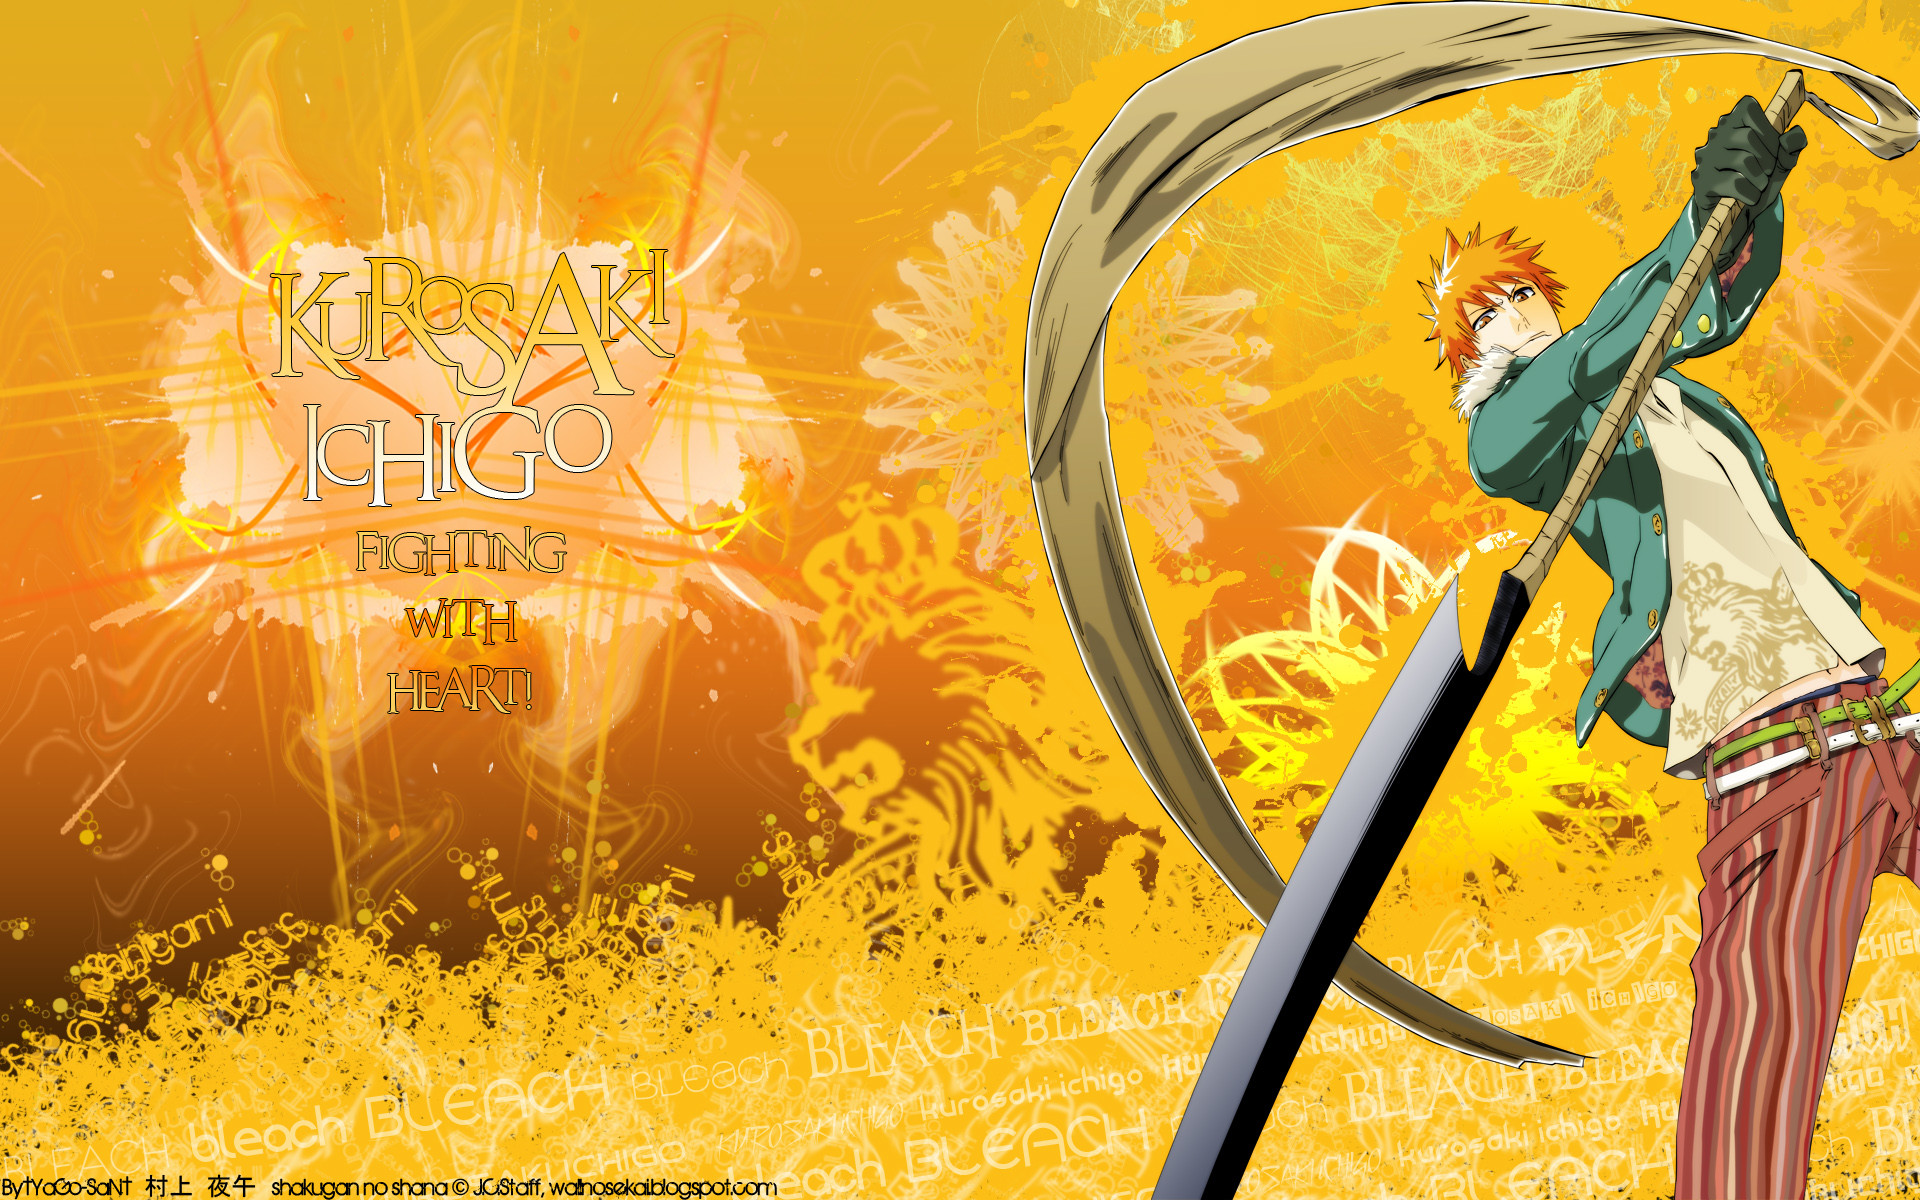 Bleach Forever images Ichigo Kurosaki HD wallpaper and background photos